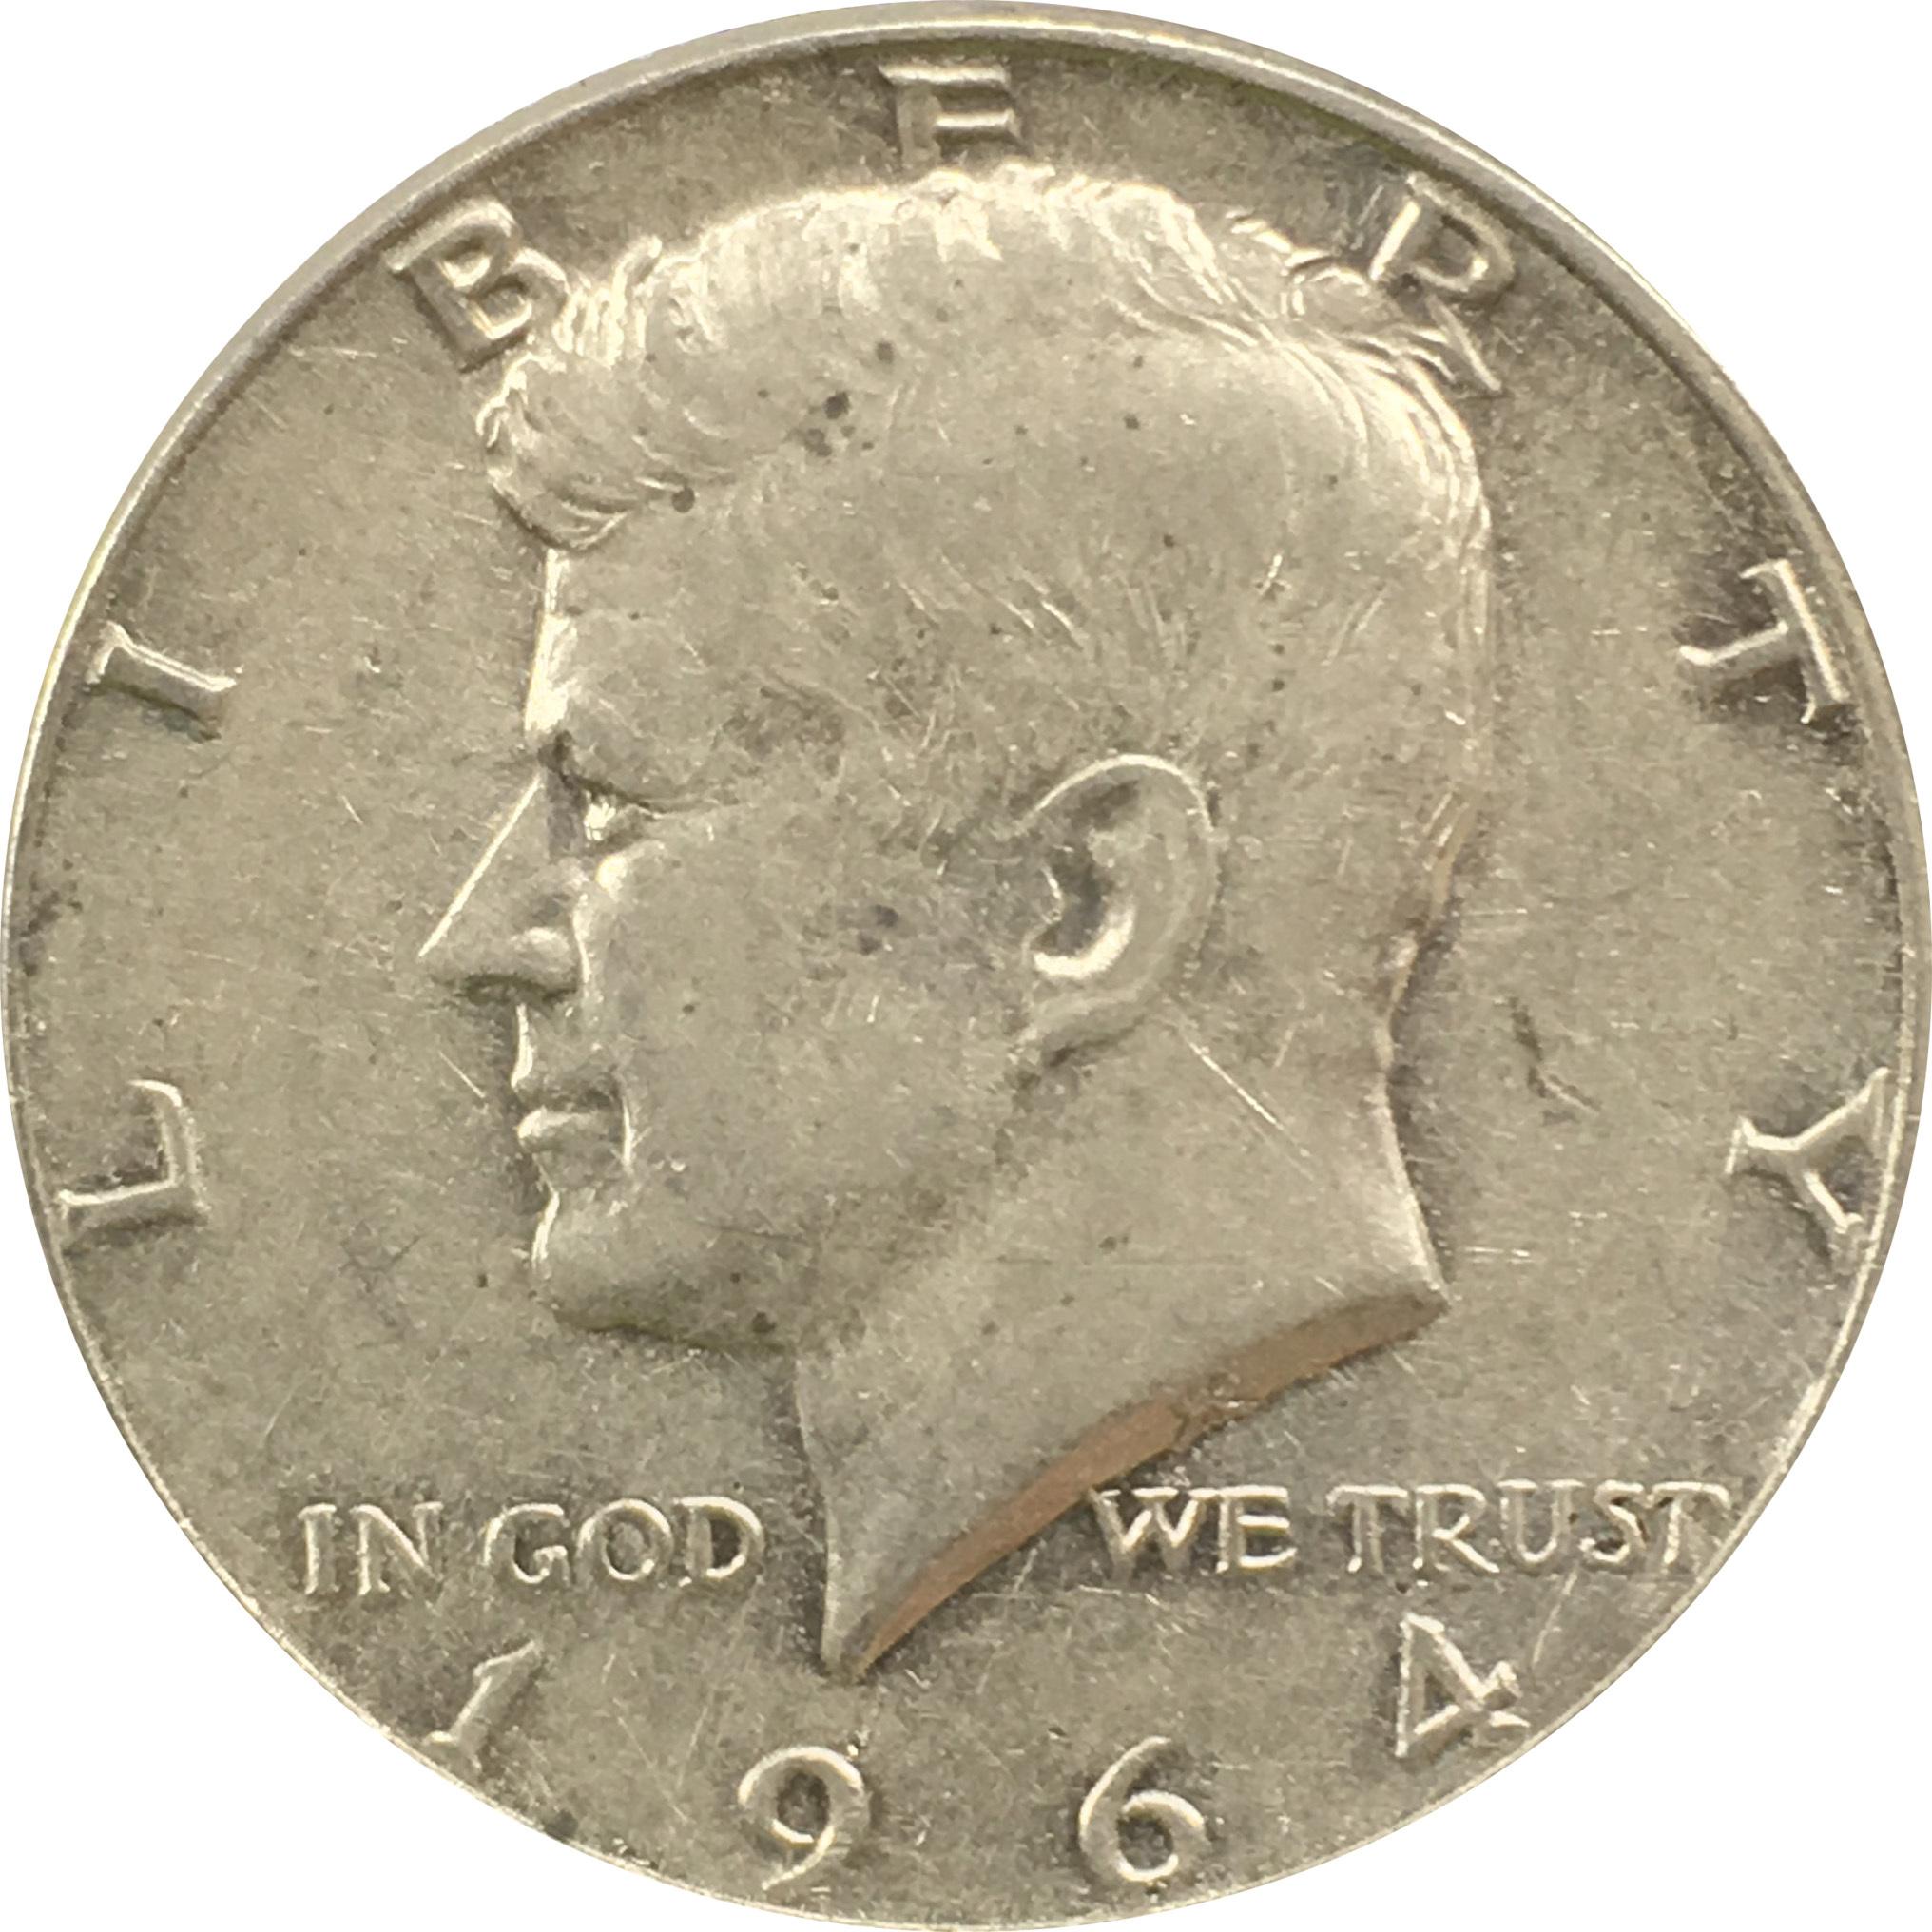 50 центов 1964 год. Кеннеди (без двора)